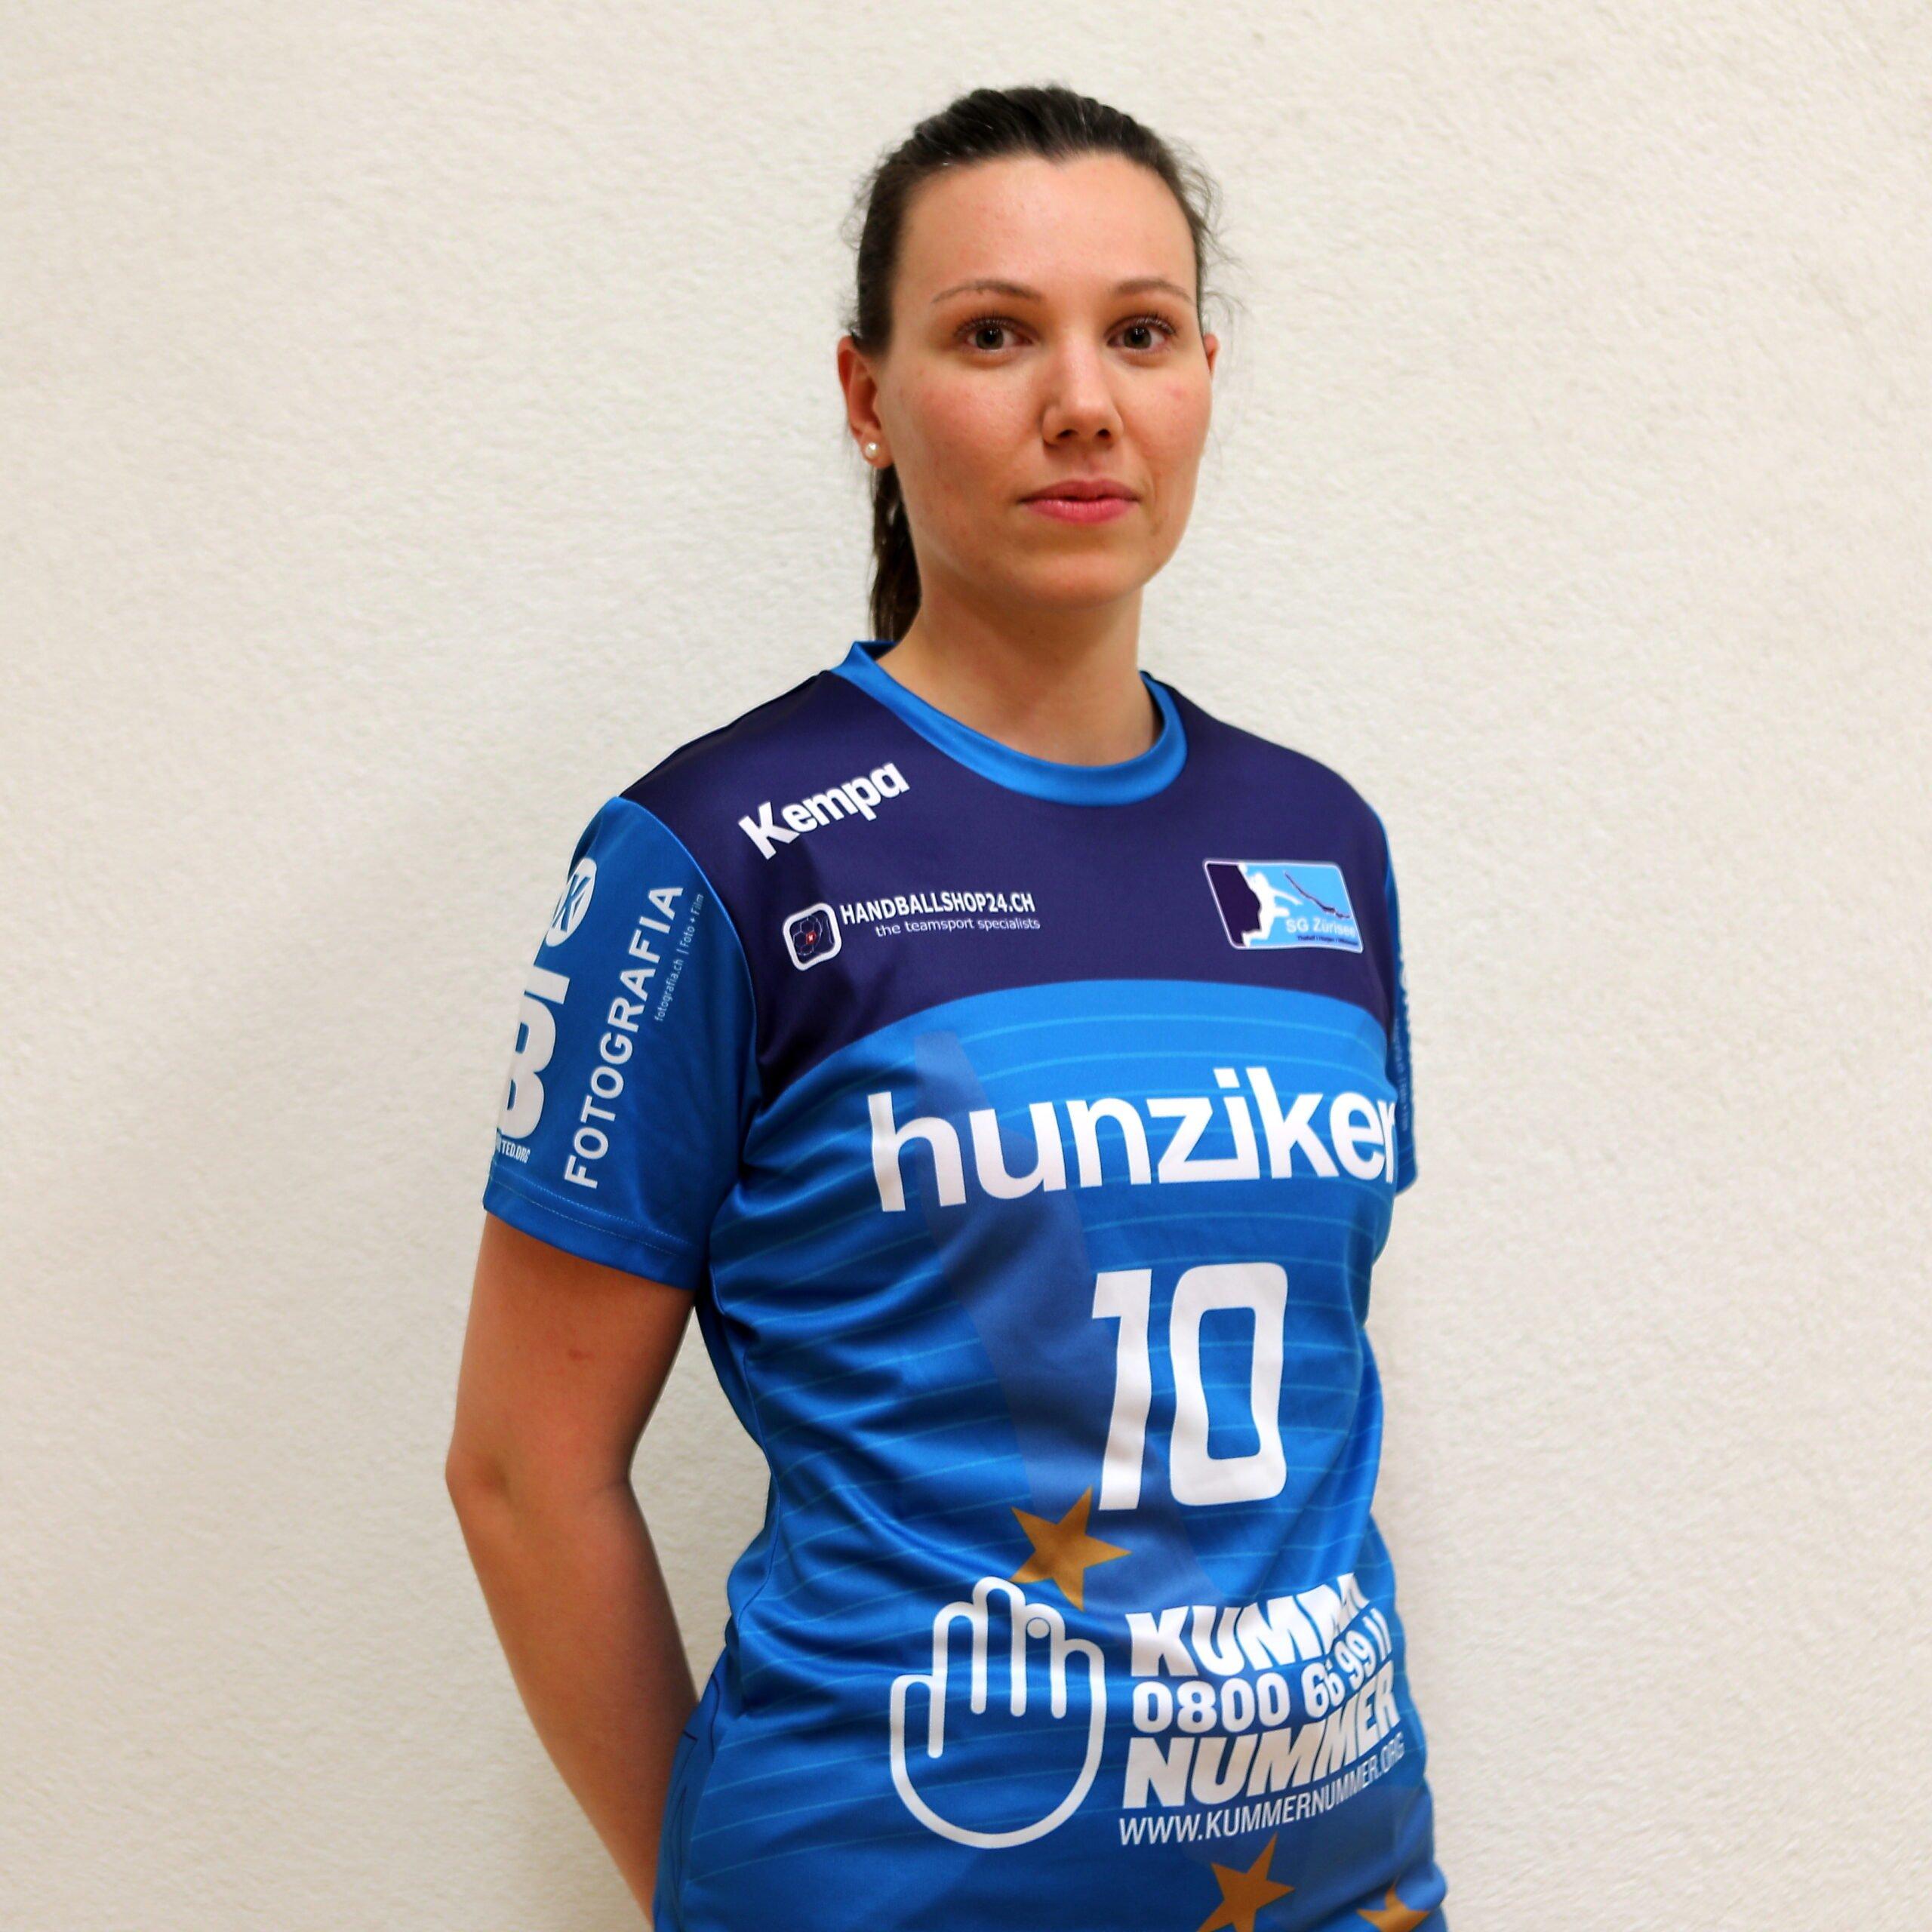 Nicole Hunziker